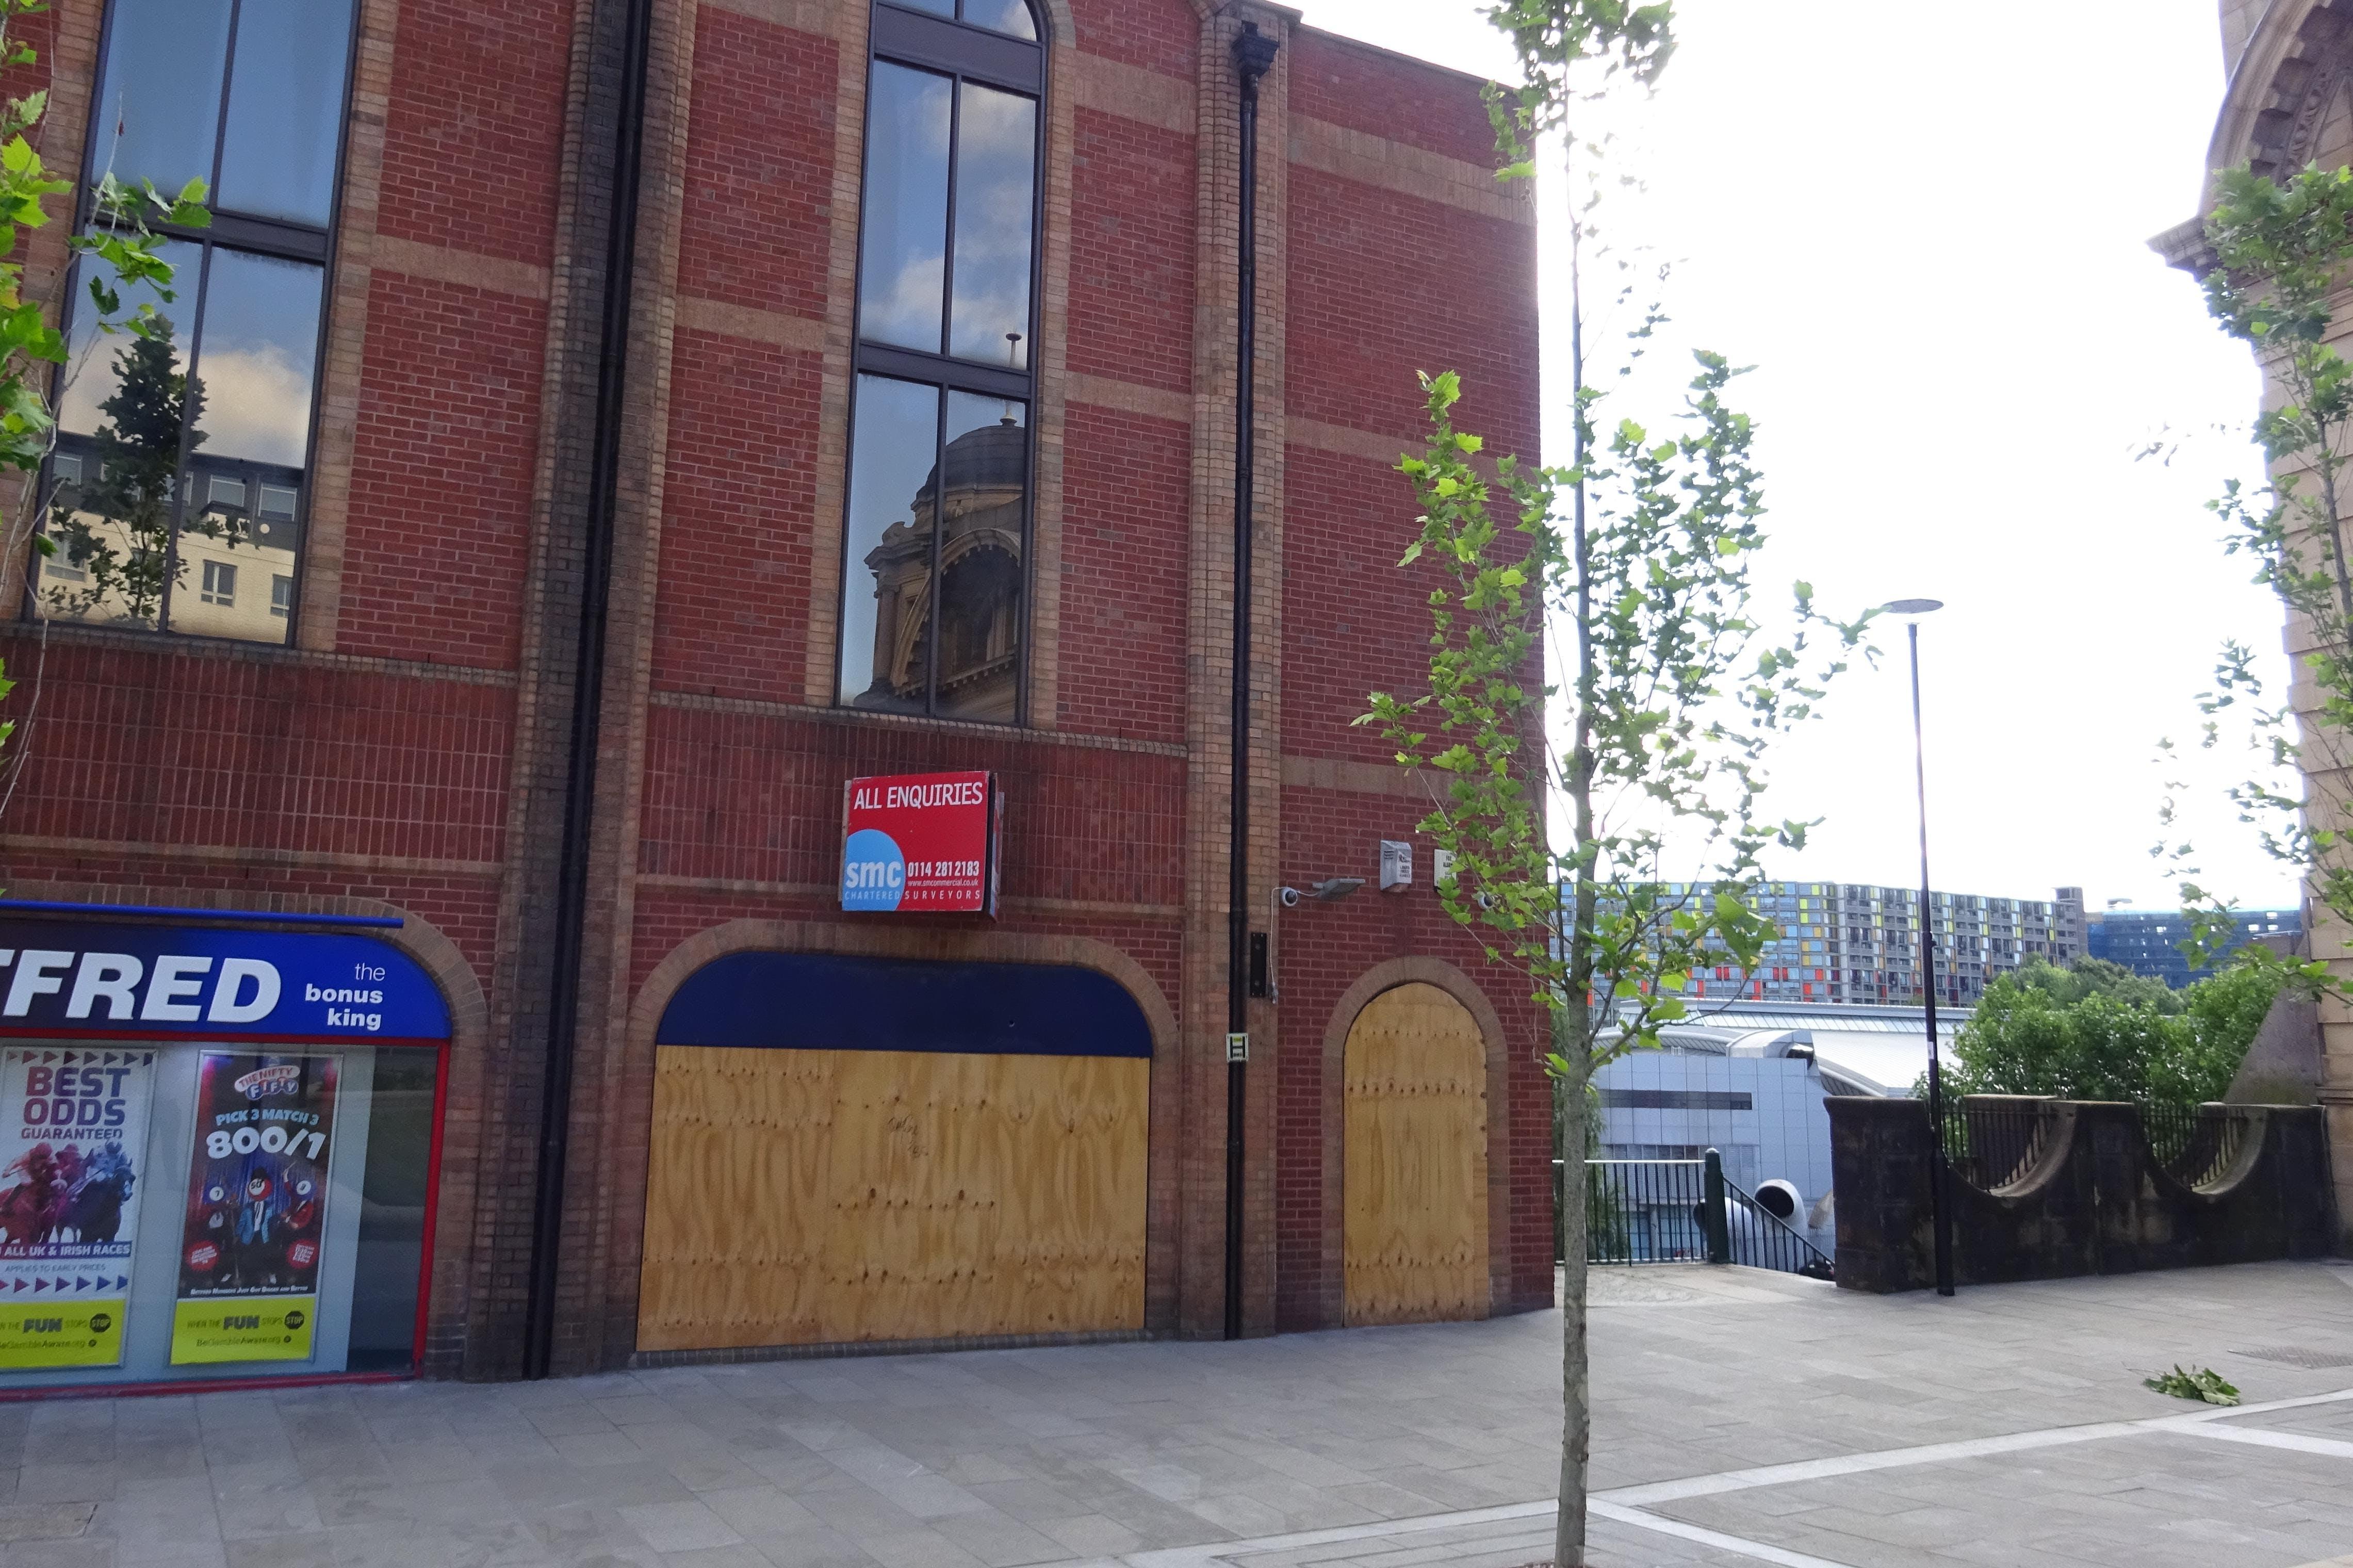 15 Fitzalan Square, Sheffield, Retail / Restaurant To Let - 15_Fitzalan_Square_Sheffield_Commercial_Property_To_Let.JPG